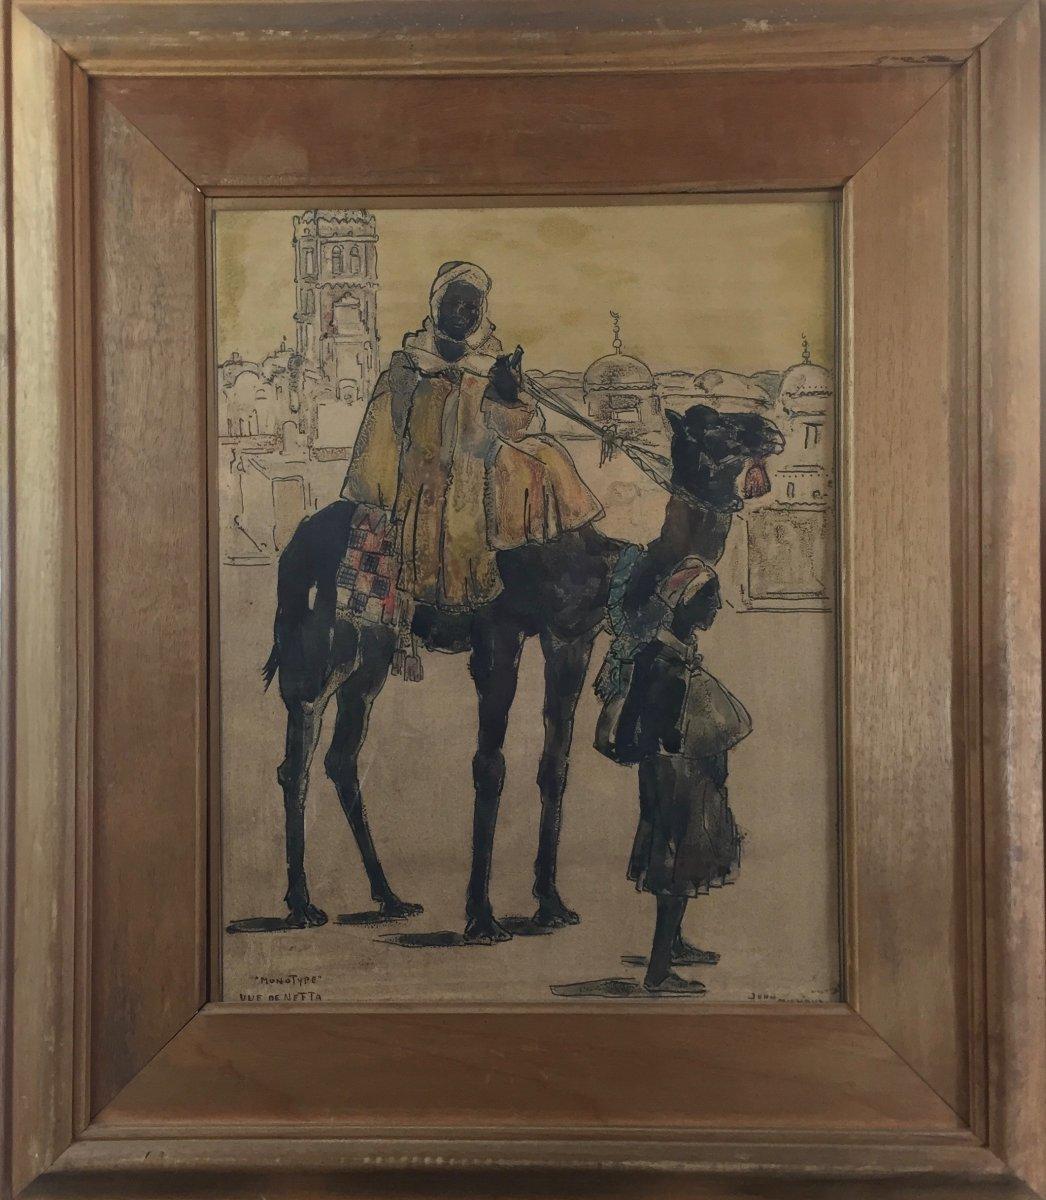 John Michaux (1876-1957), View Of Nefta Morocco